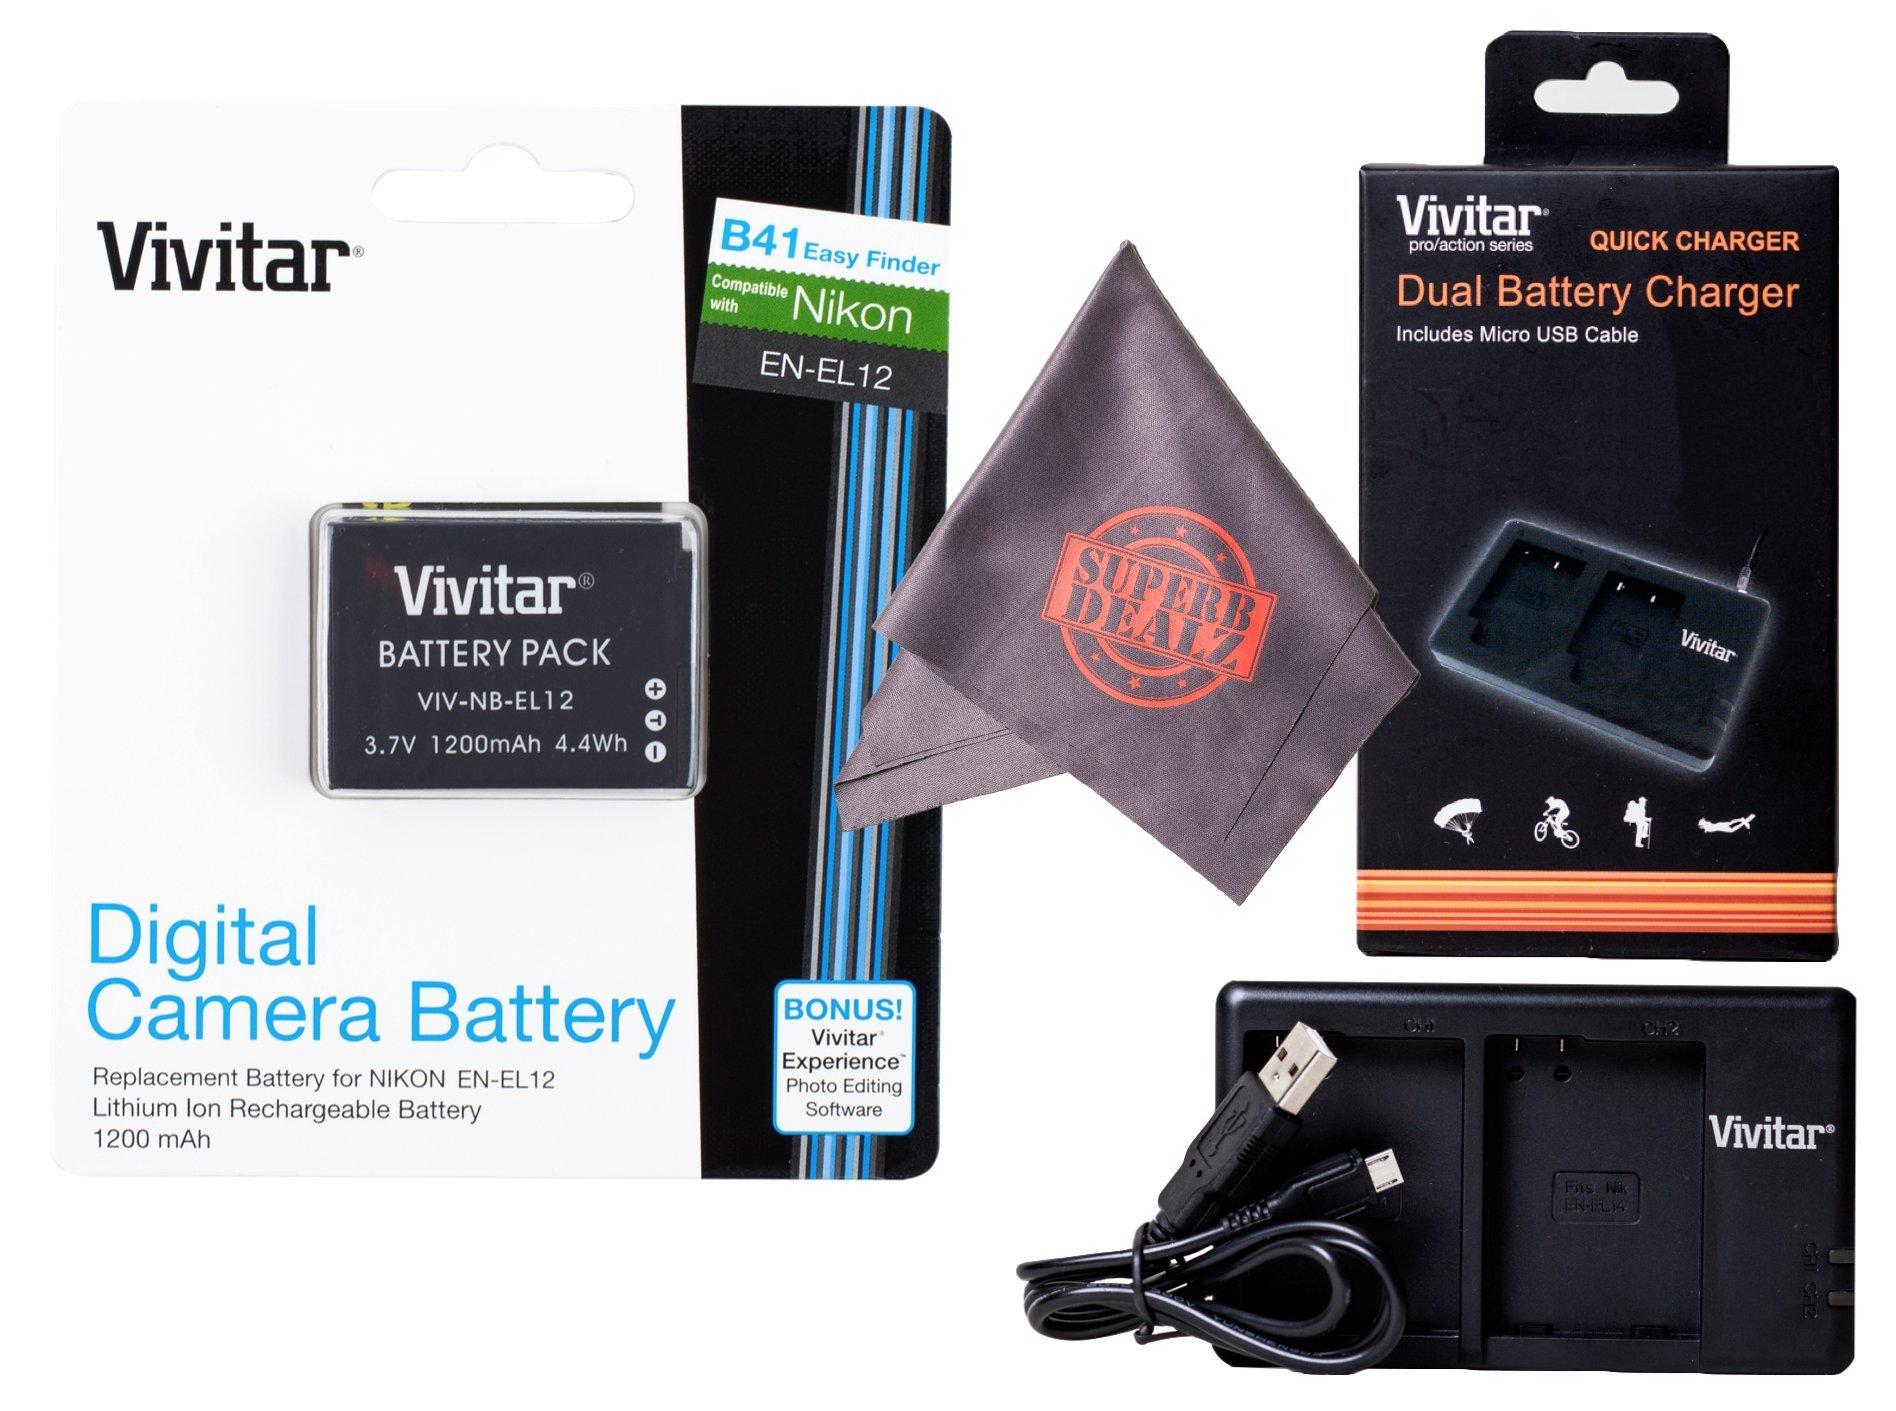 Vivitar EN-EL12 Ultra High Capacity Rechargeable 1200mAh Li-ion Battery + Vivitar Dual Charger + Microfiber Lens Cleaning Cloth for NIKON Coolpix Cameras (Nikon EN-EL12 Replacement)